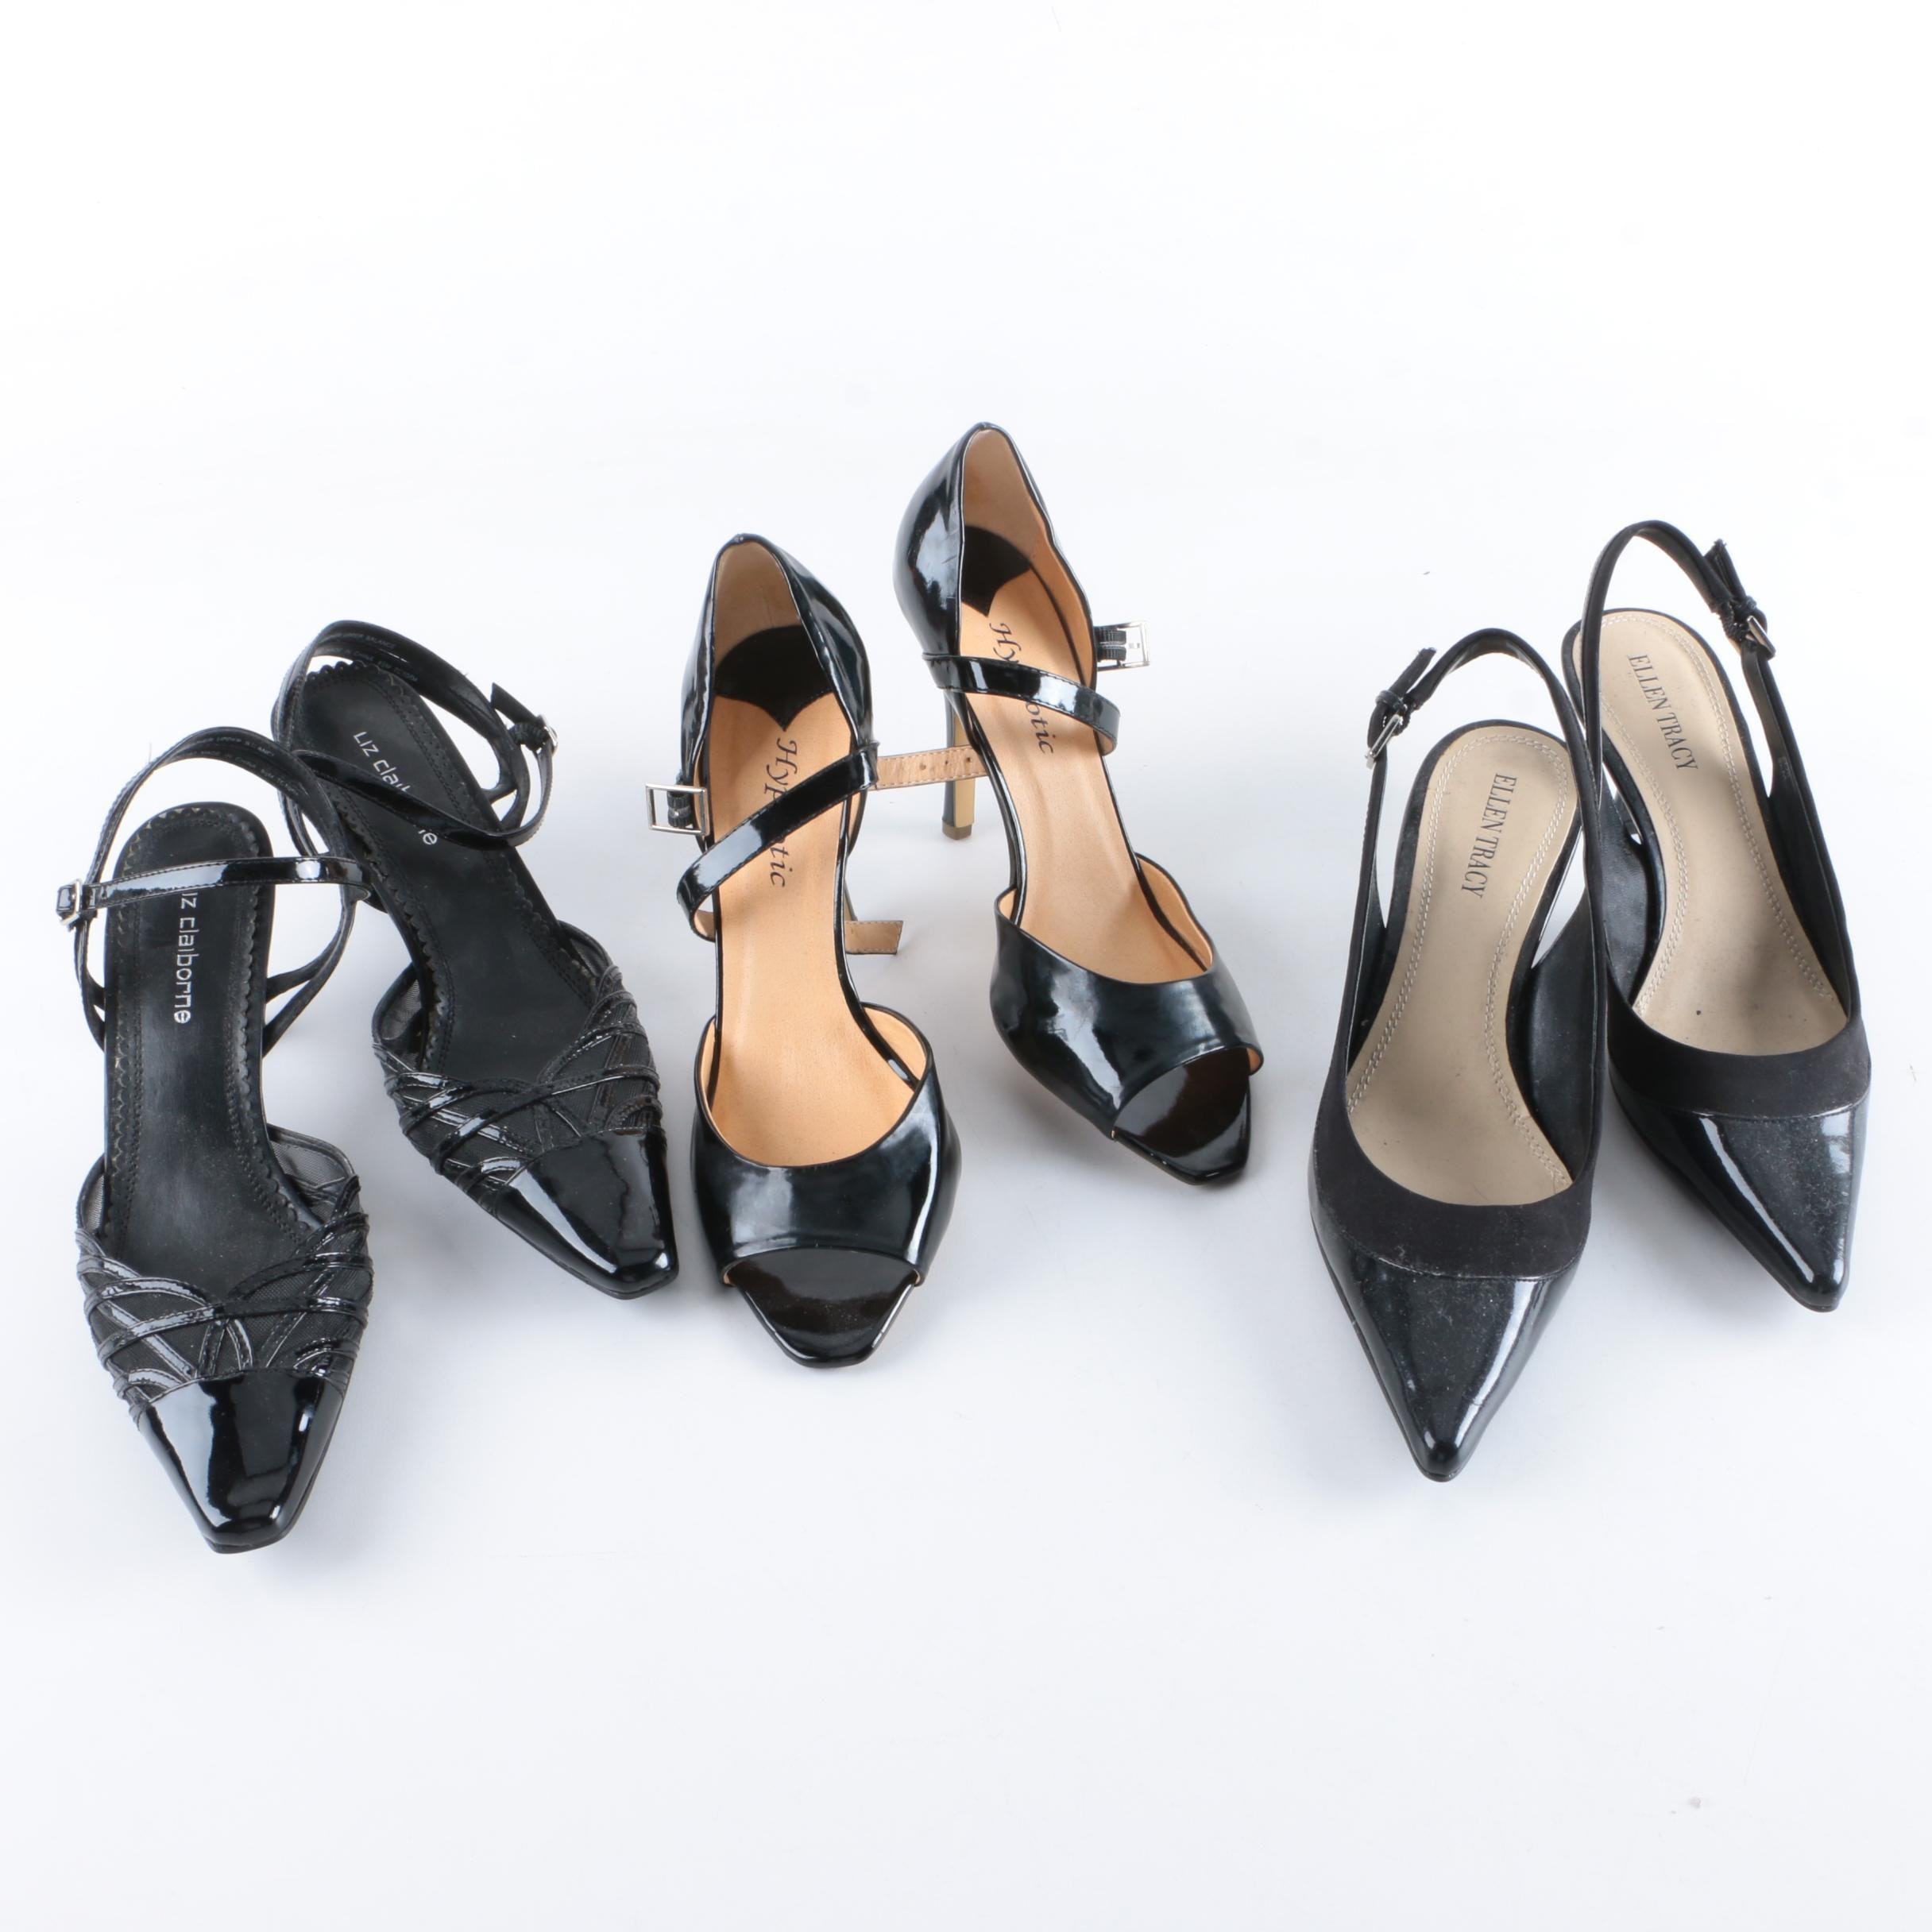 Women's Black Patent Leather High Heels